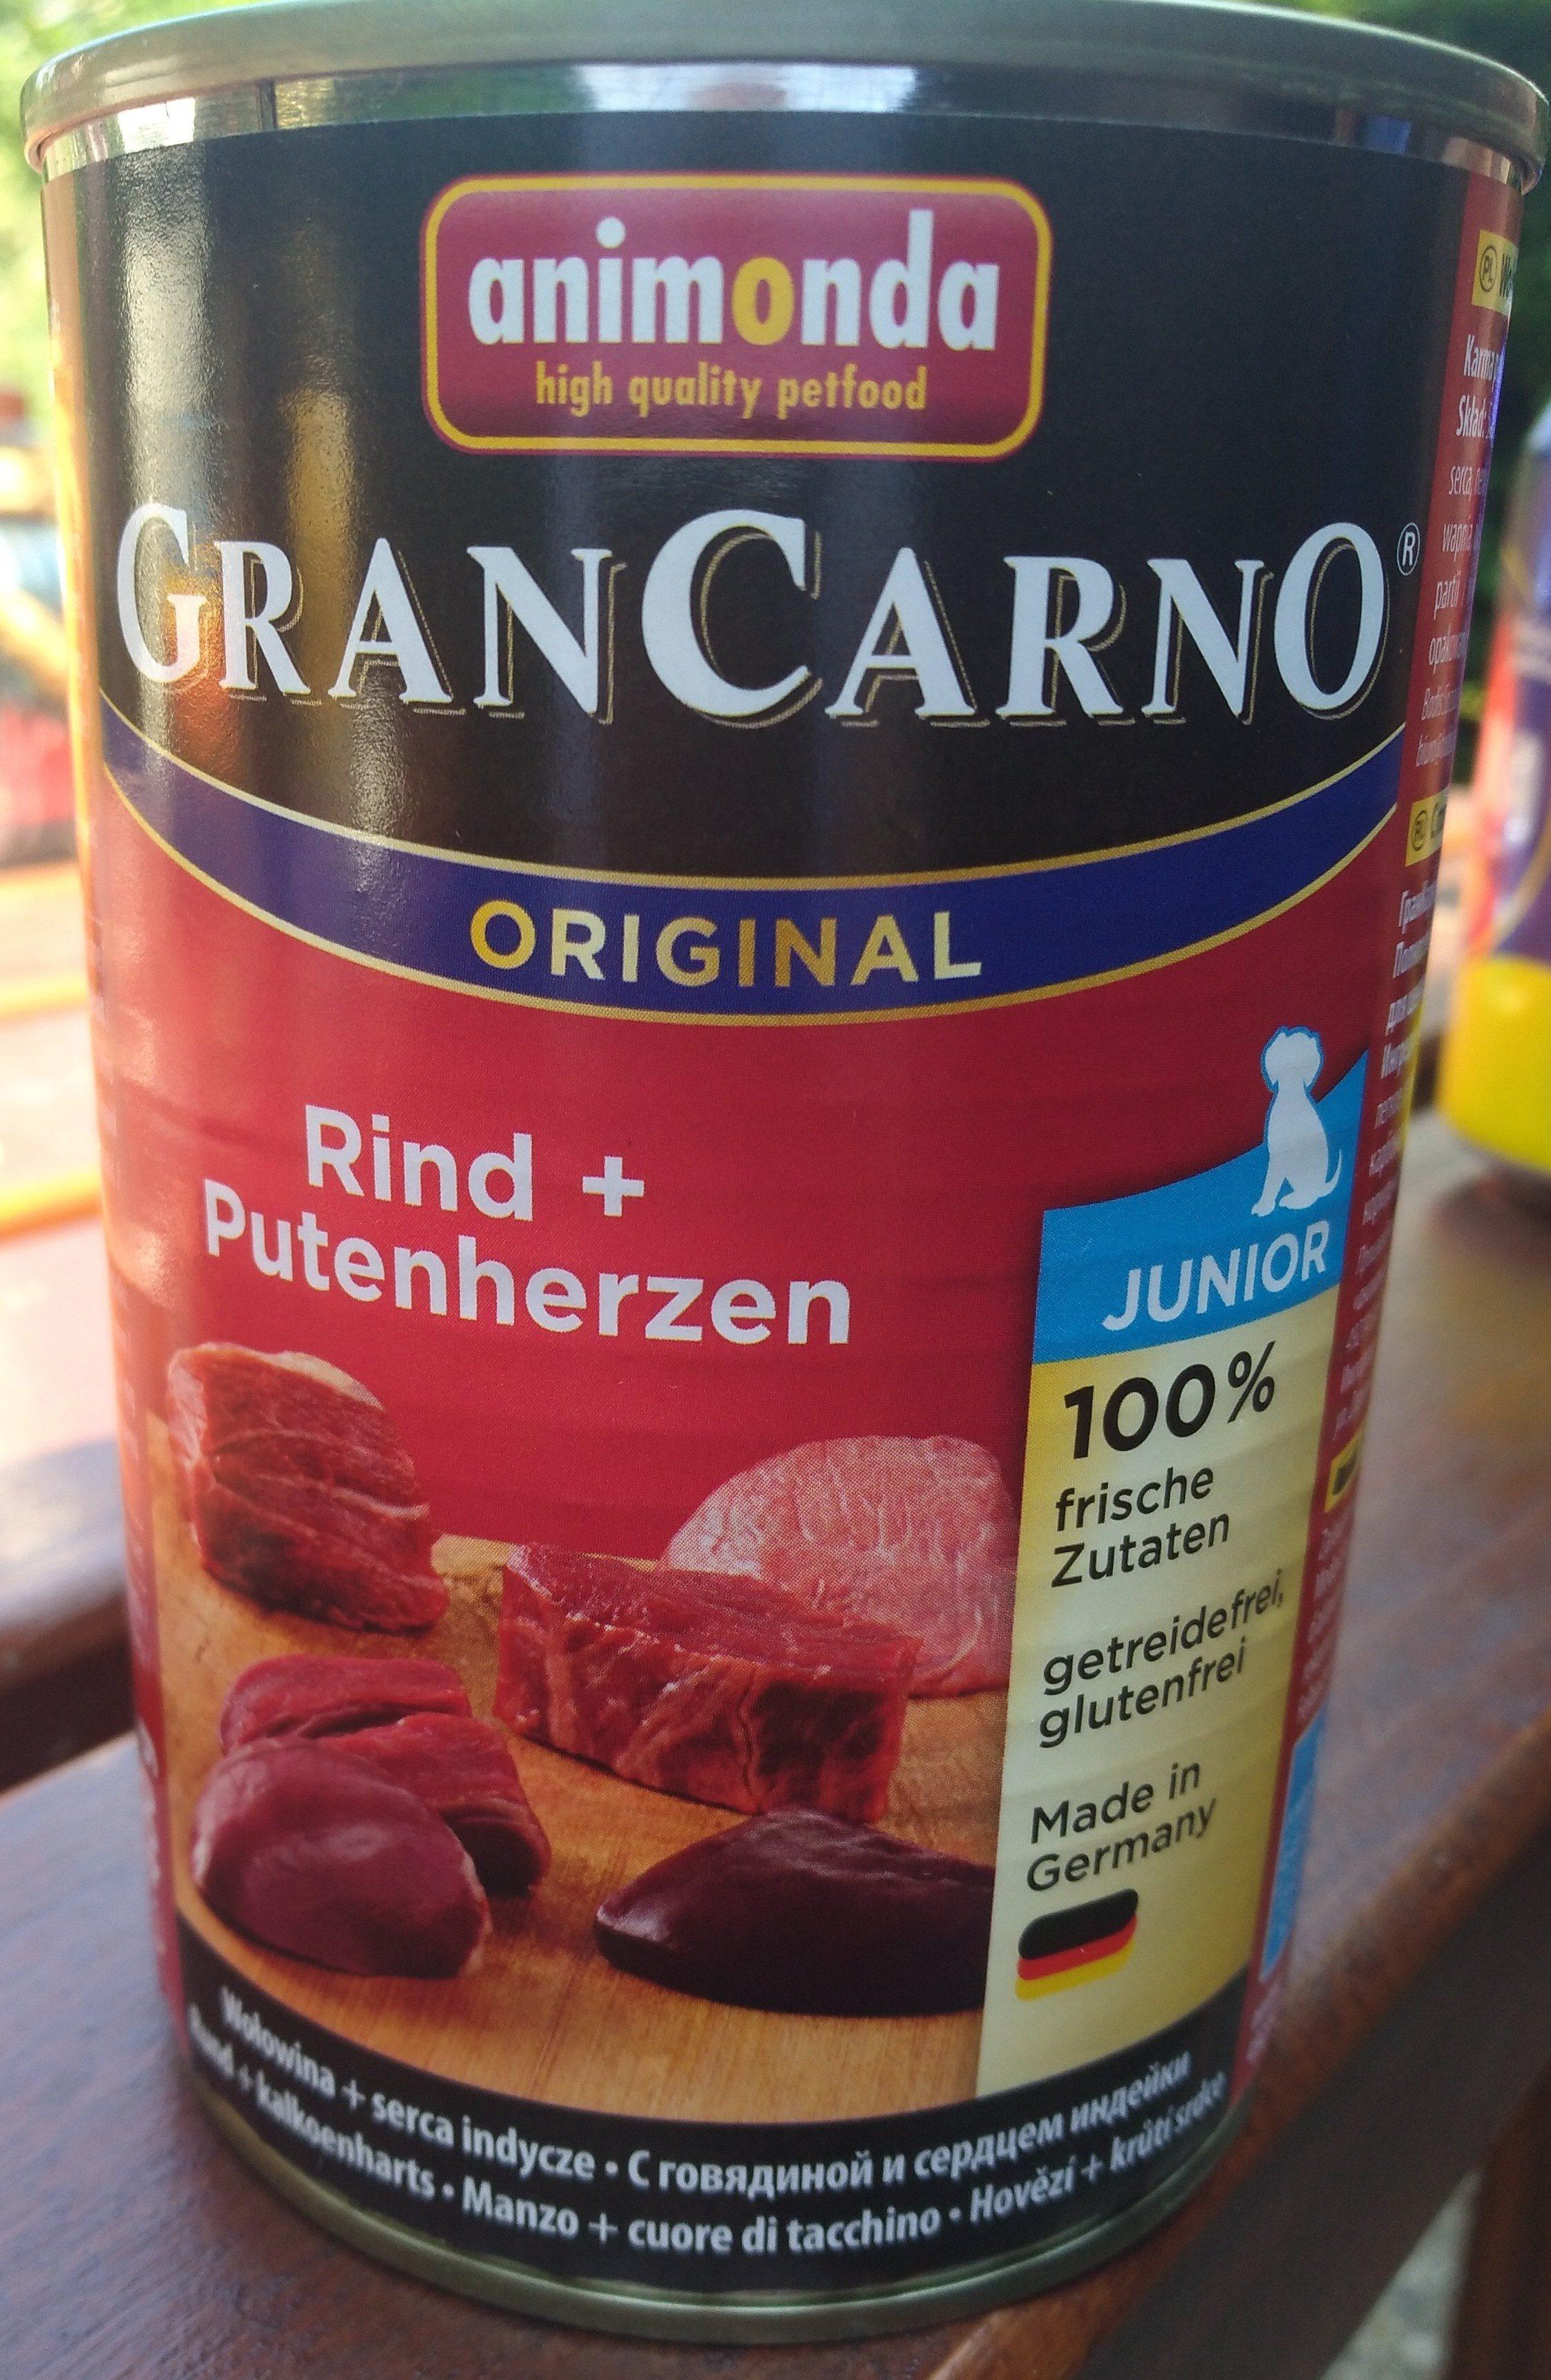 GranCarno Original Rind + Phtenherzen - Product - de